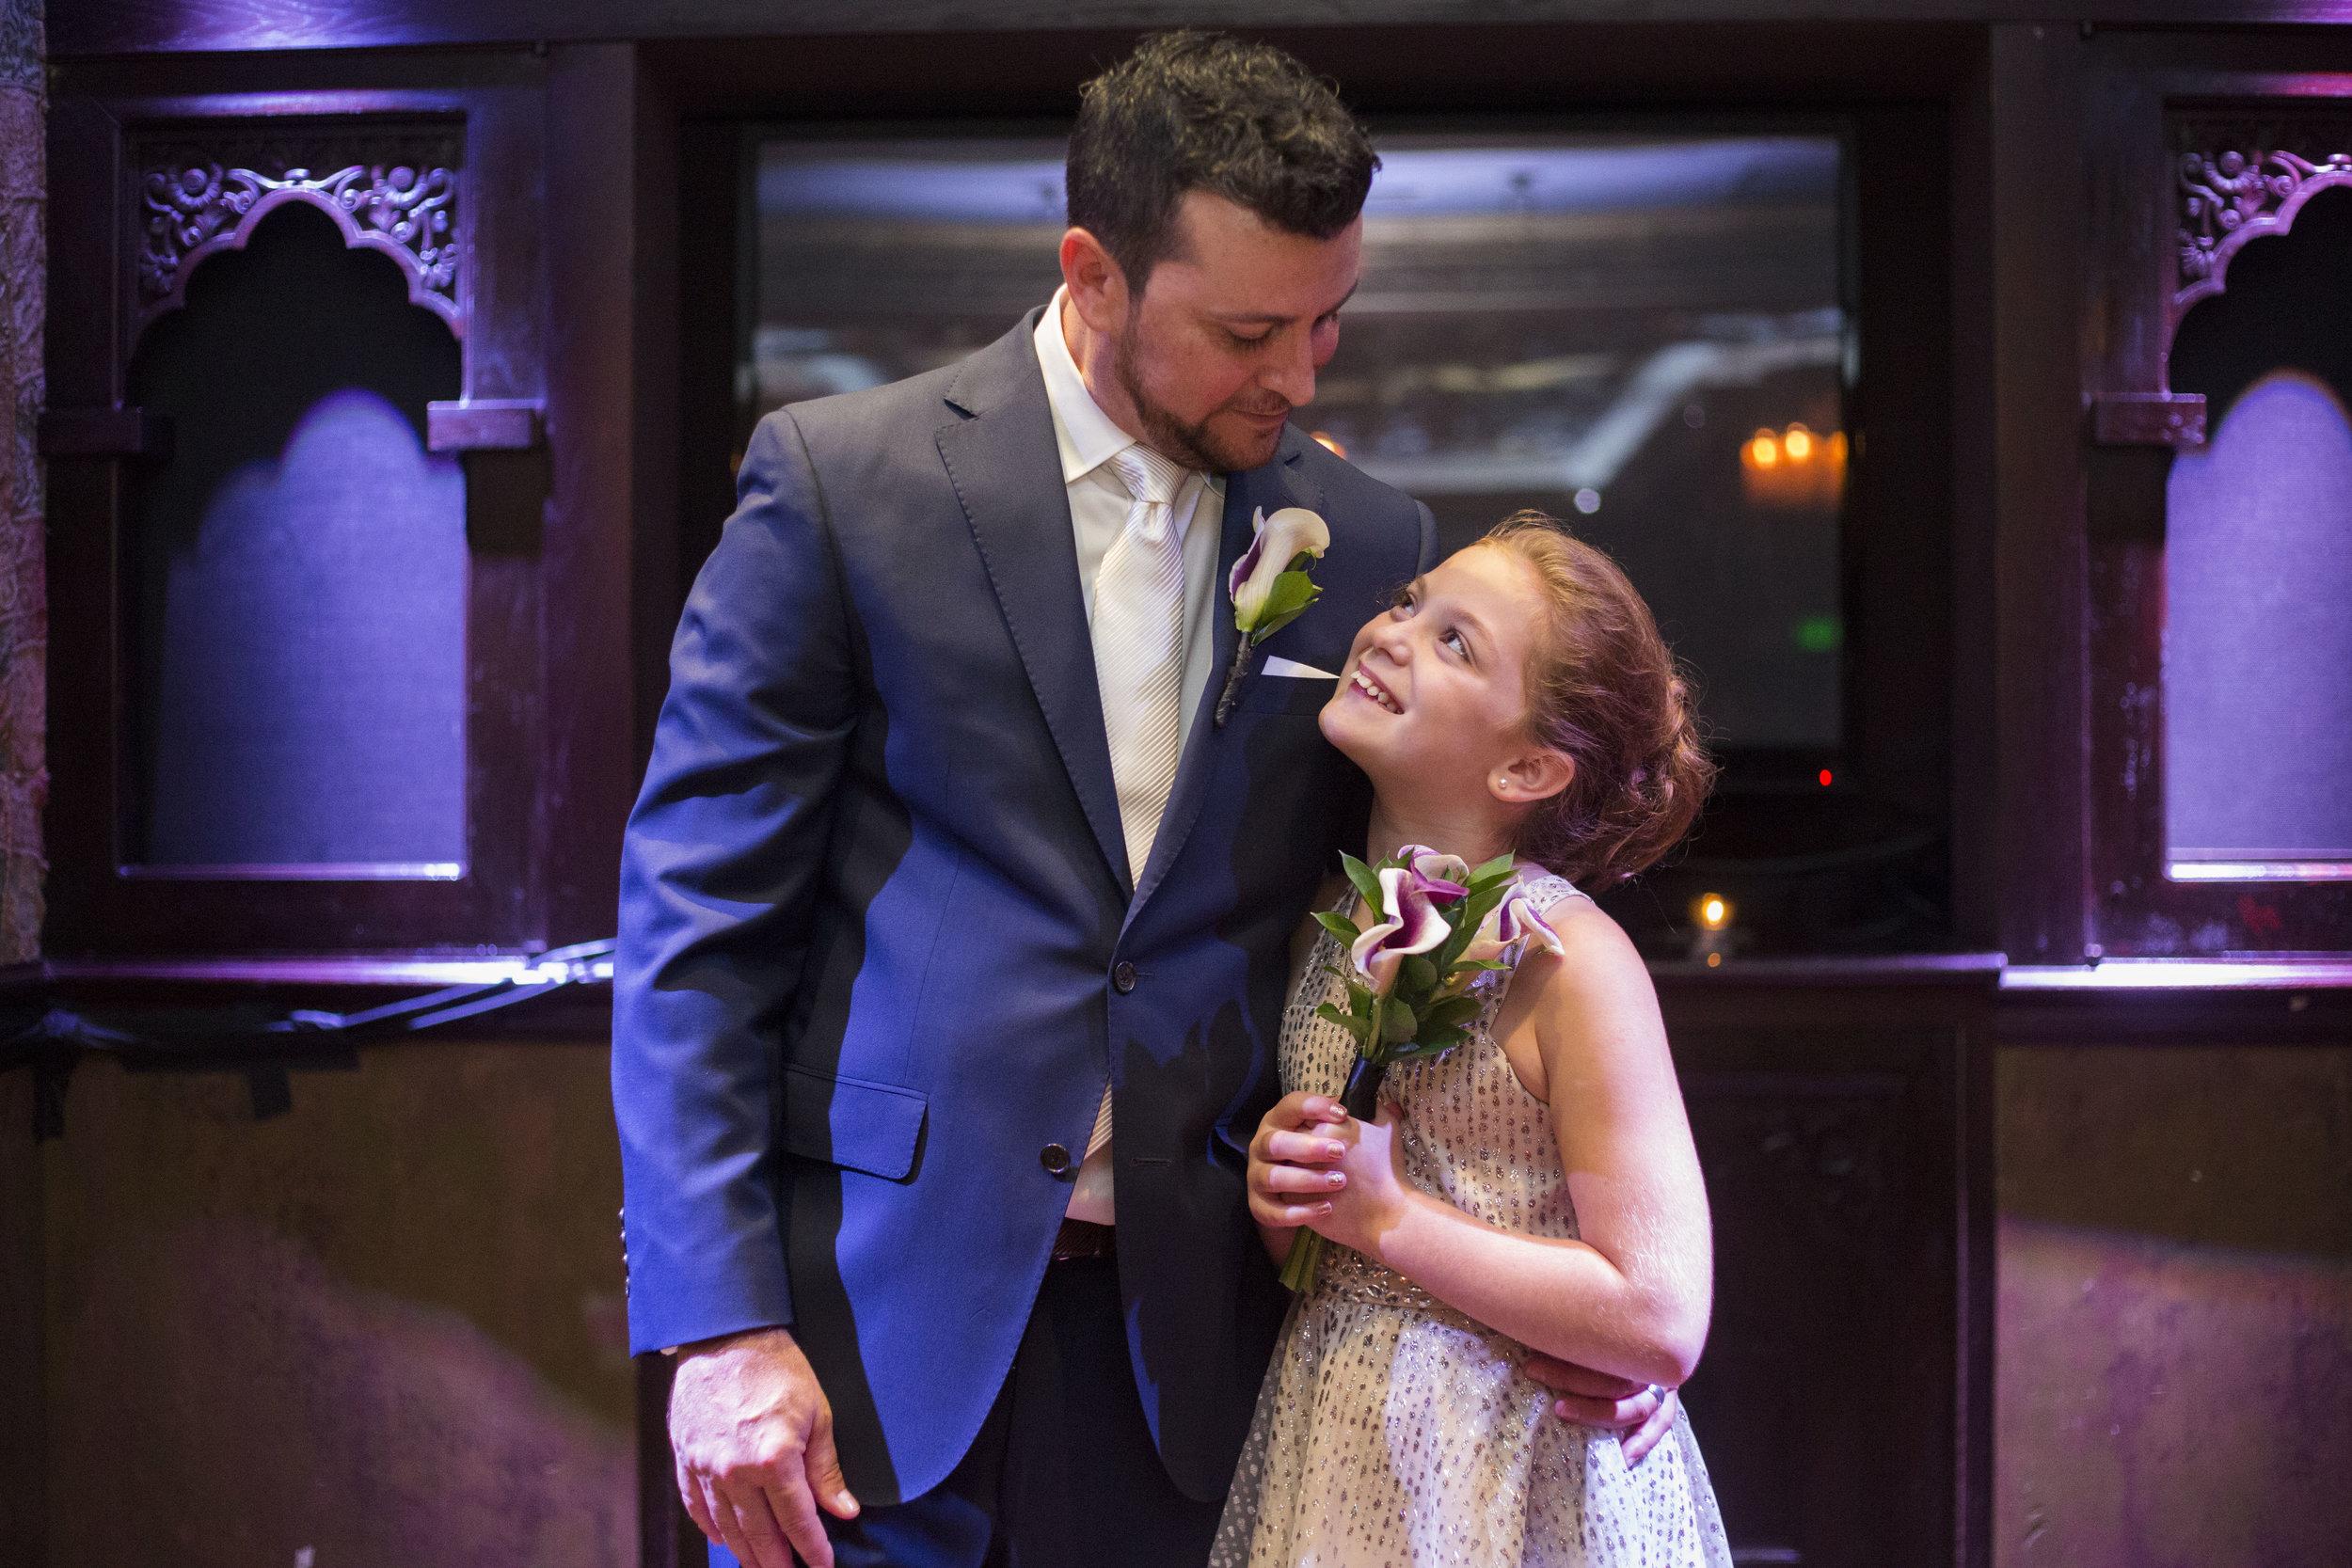 ATGI_Kat and Gabe Wedding 2016_2S8A5430.jpg